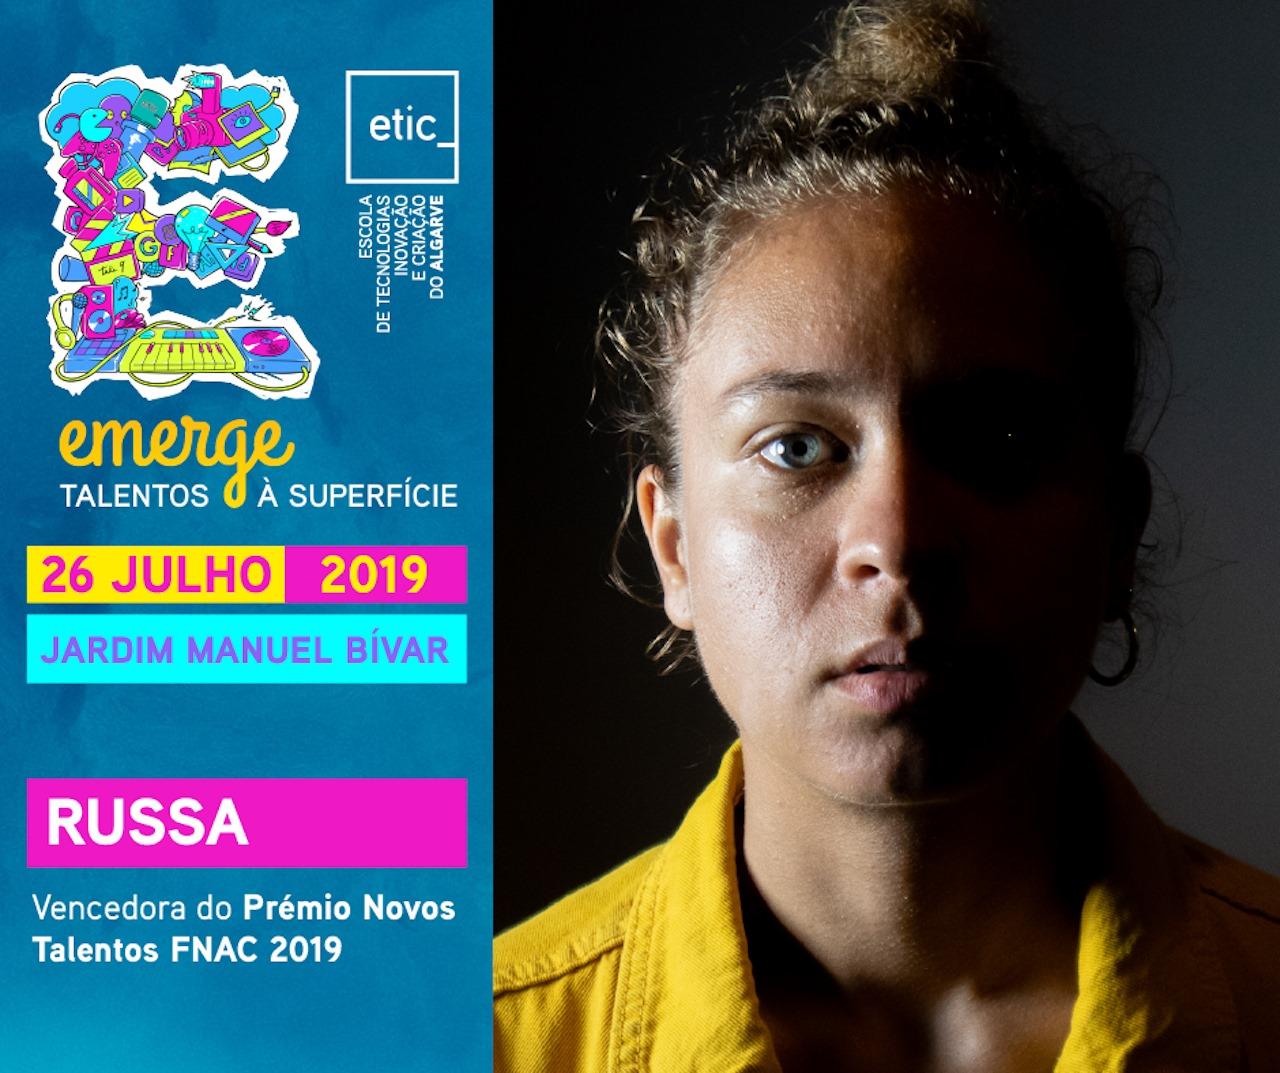 RUSSA @ Emerge Talentos à Superfície ETIC_Algarve (Faro)